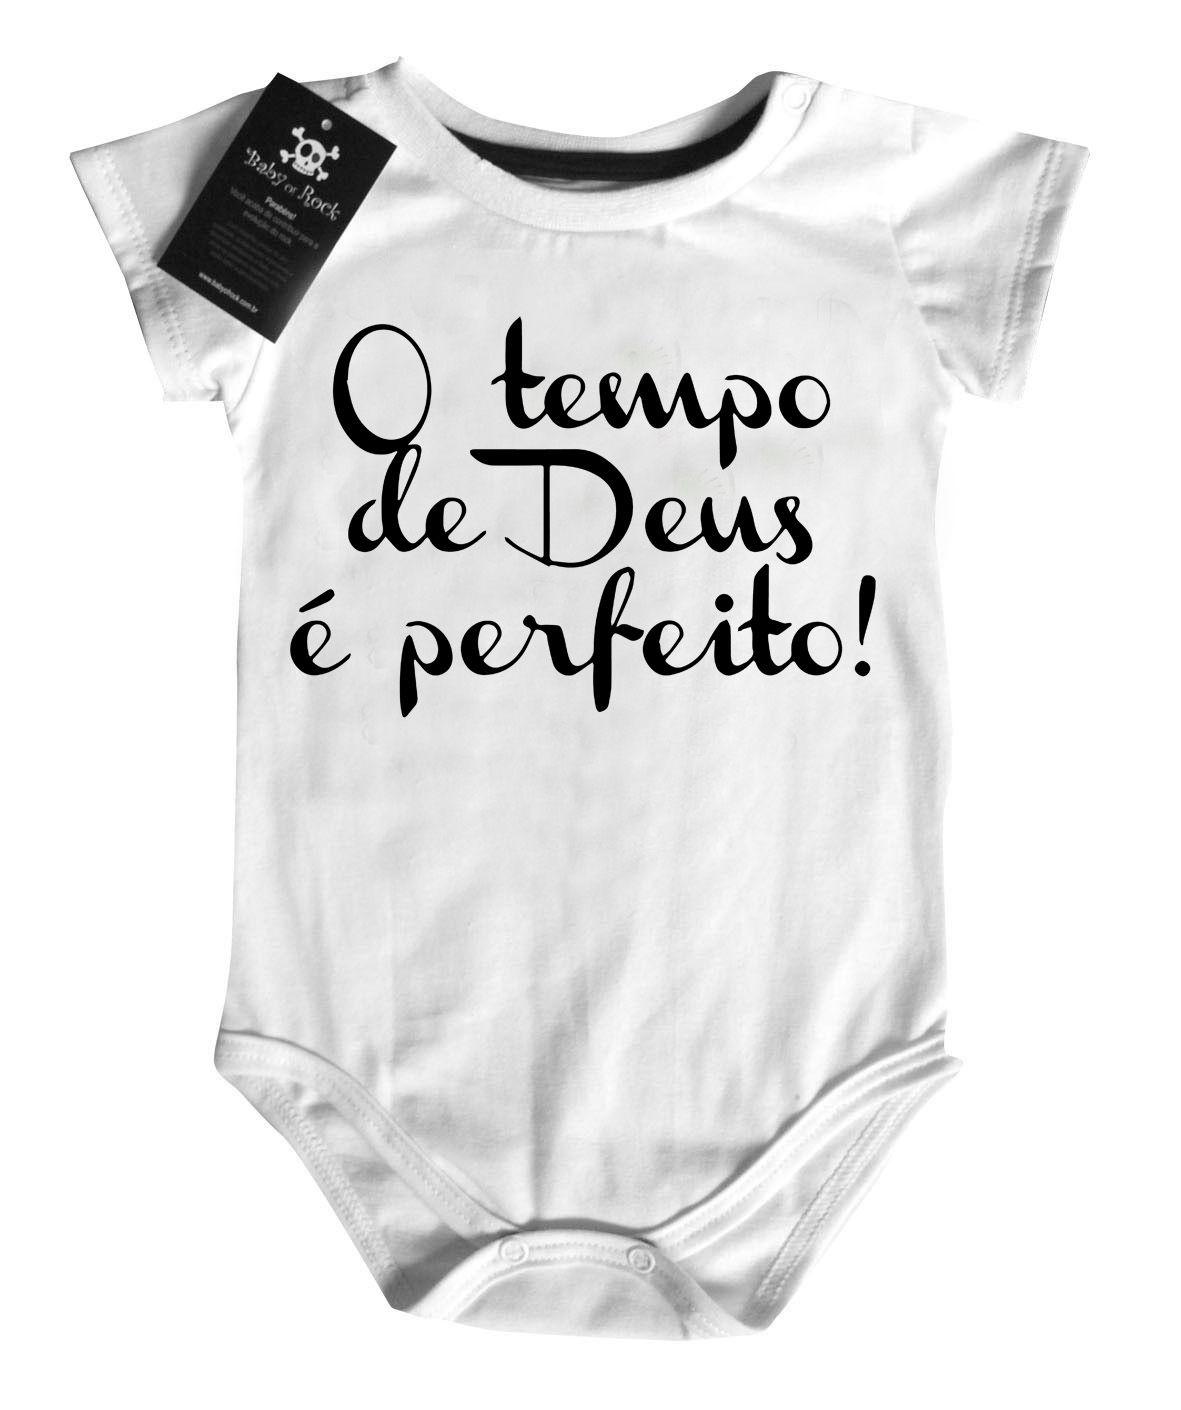 Body Gospel Tempo de Deus - White  - Baby Monster S/A